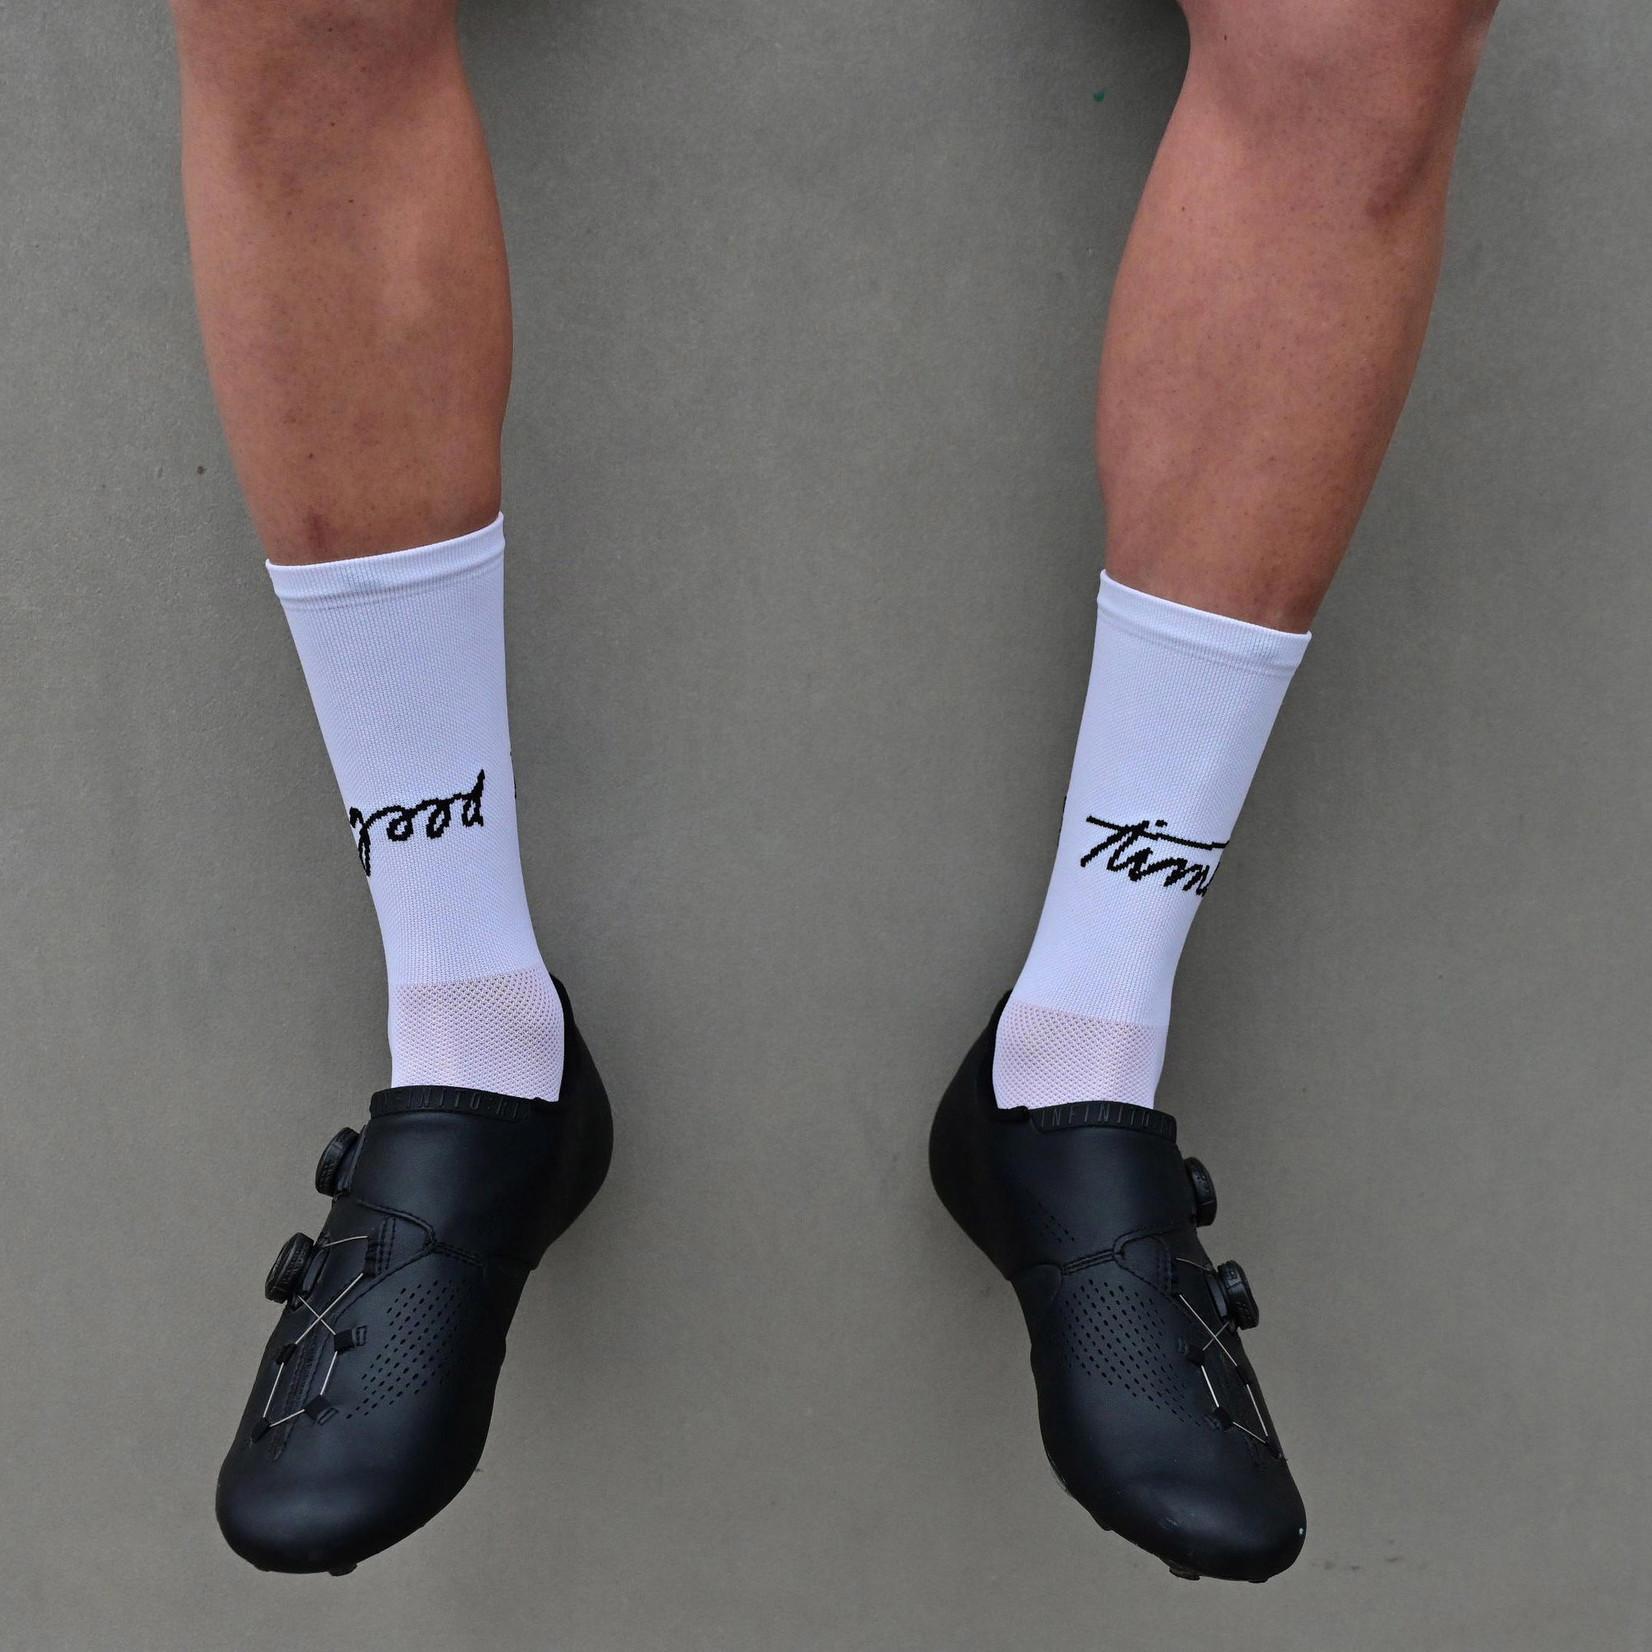 Fingerscrossed FINGERSCROSSED Socks - Good Times